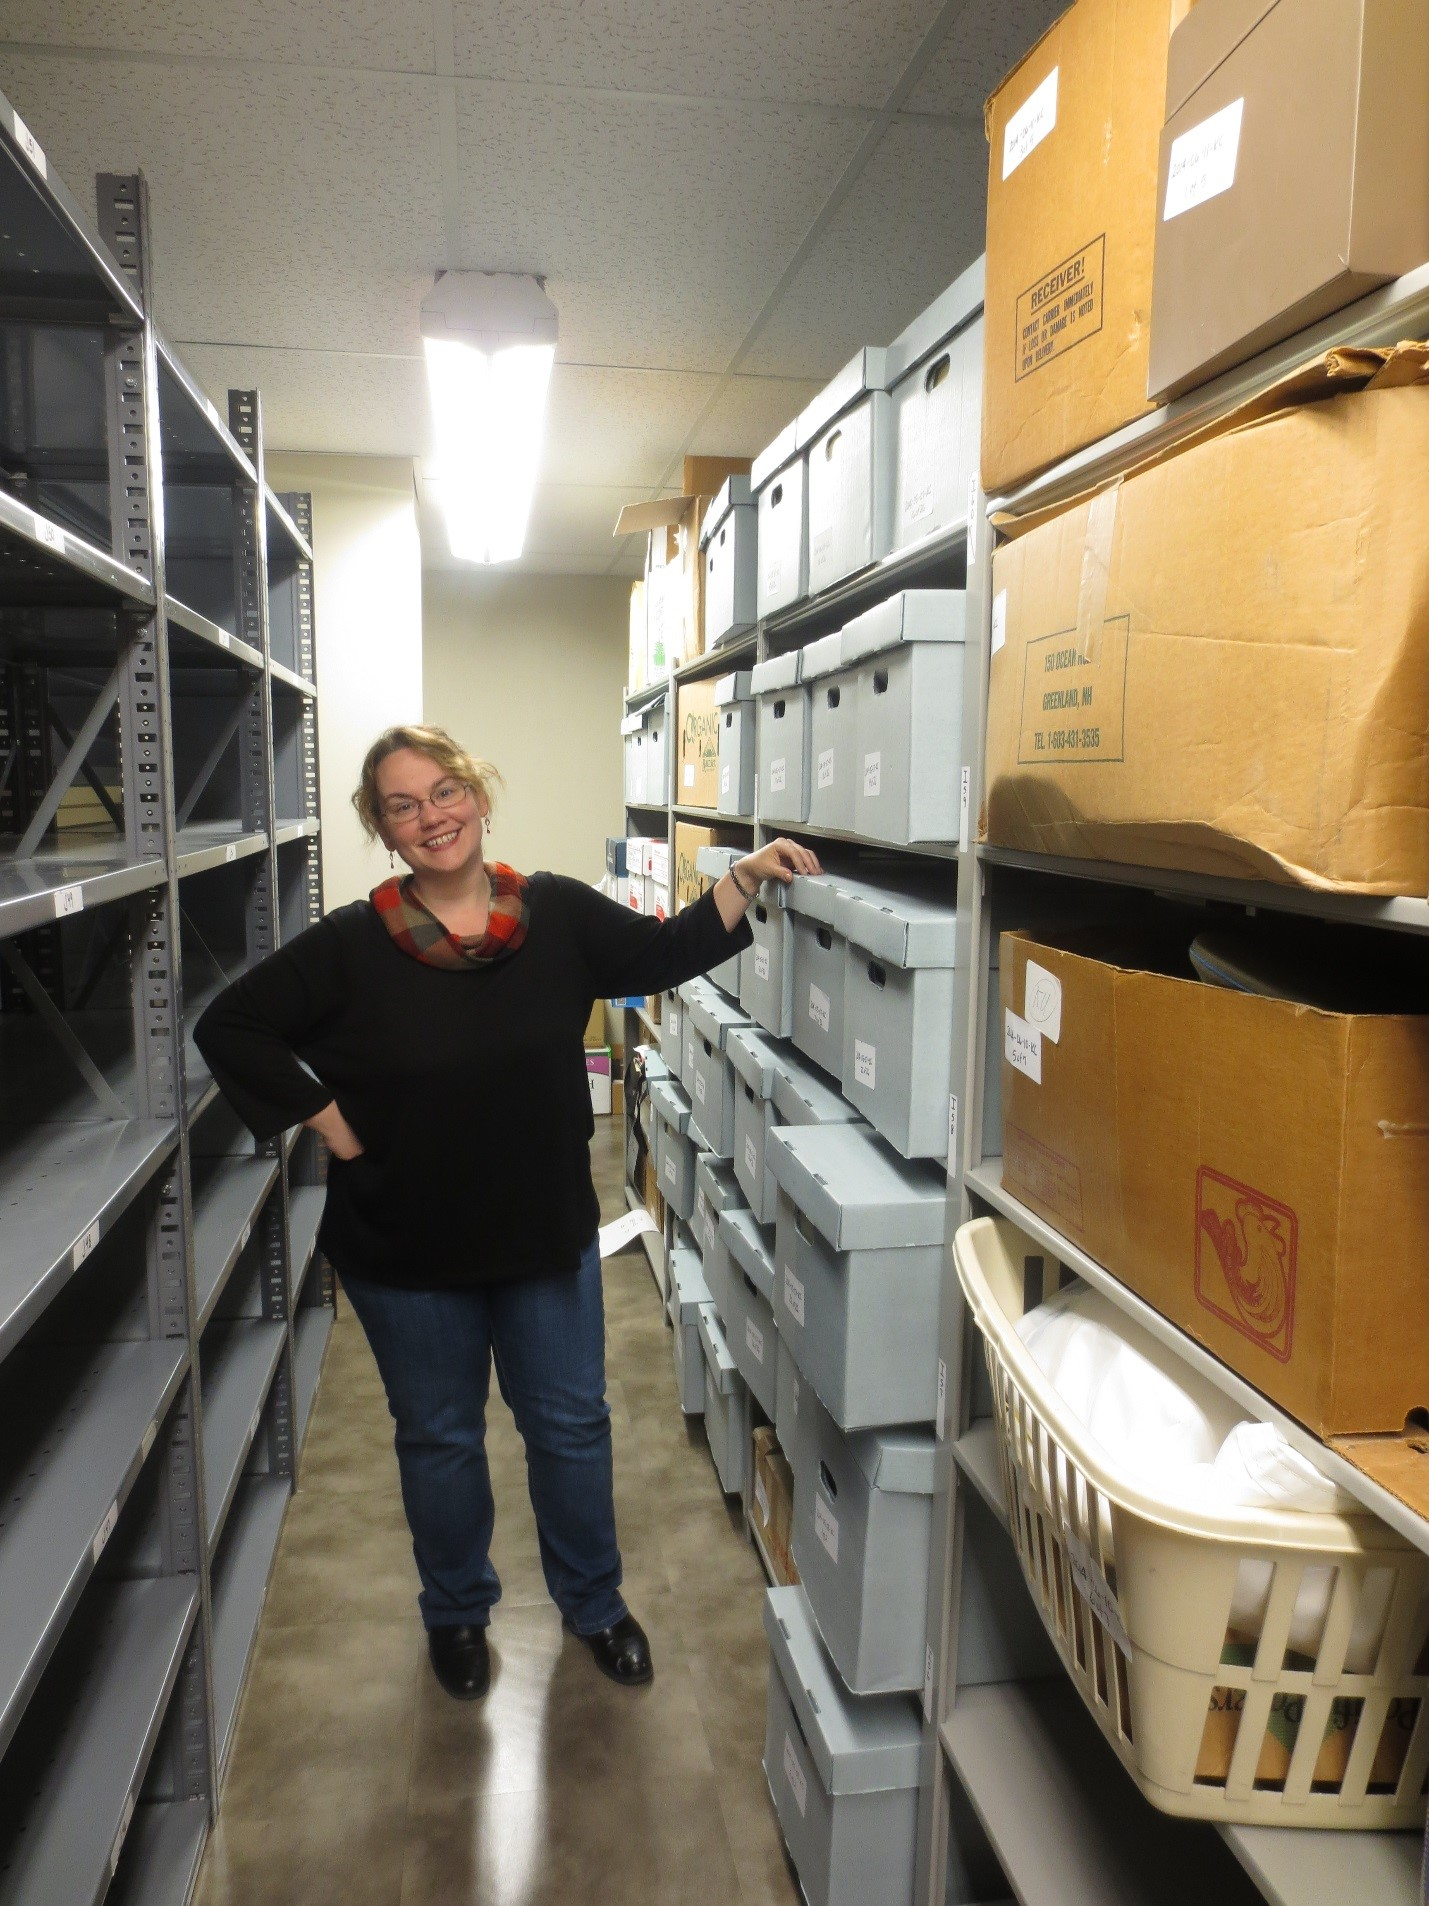 Marcella Huggard. Archives Manuscript Coordinator